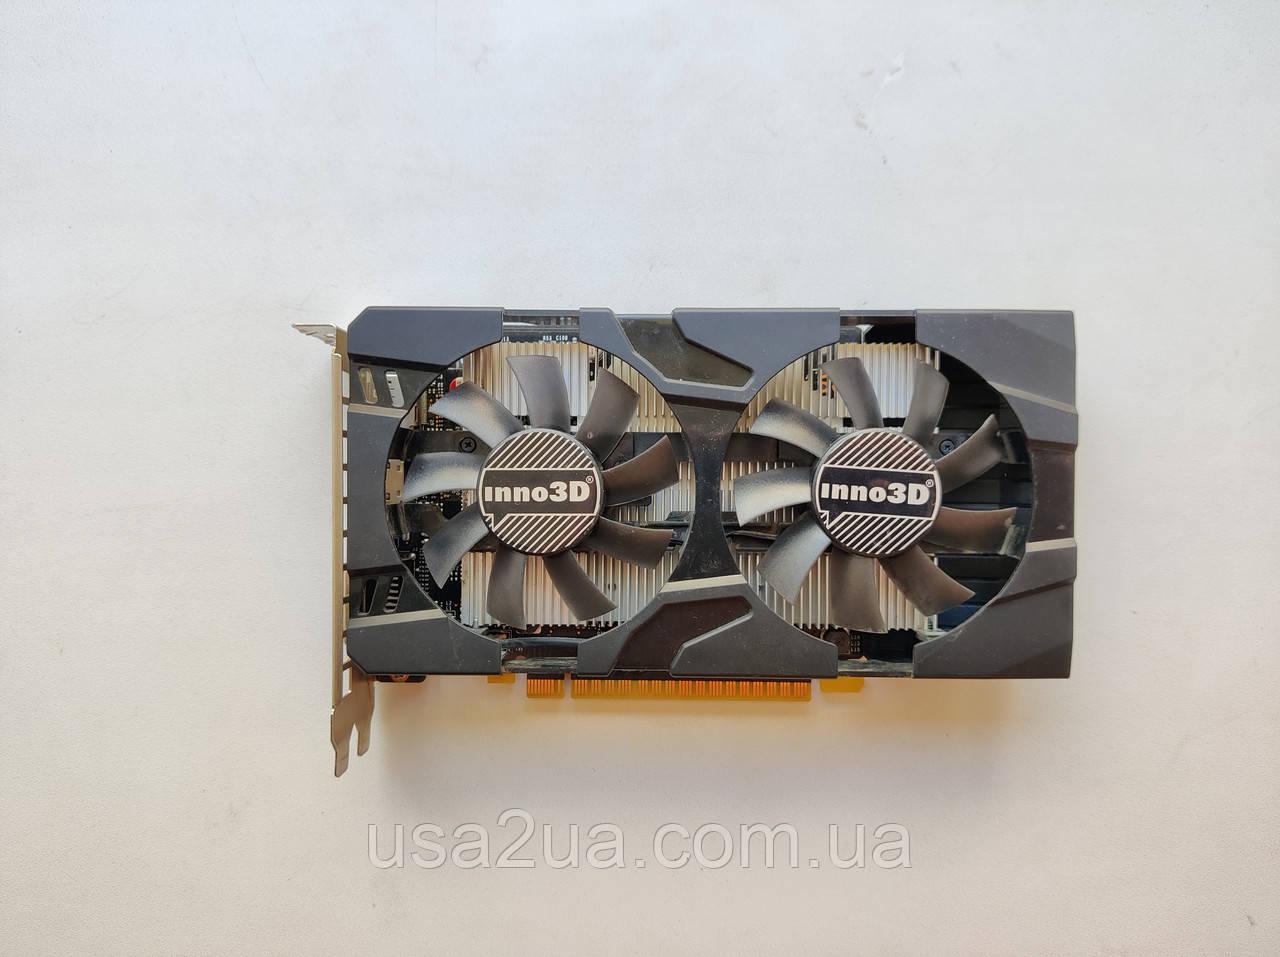 Видеокарта Inno3D PCI-Ex GeForce GTX 1050 Ti  4GB GDDR5 128bit гарантия кредит